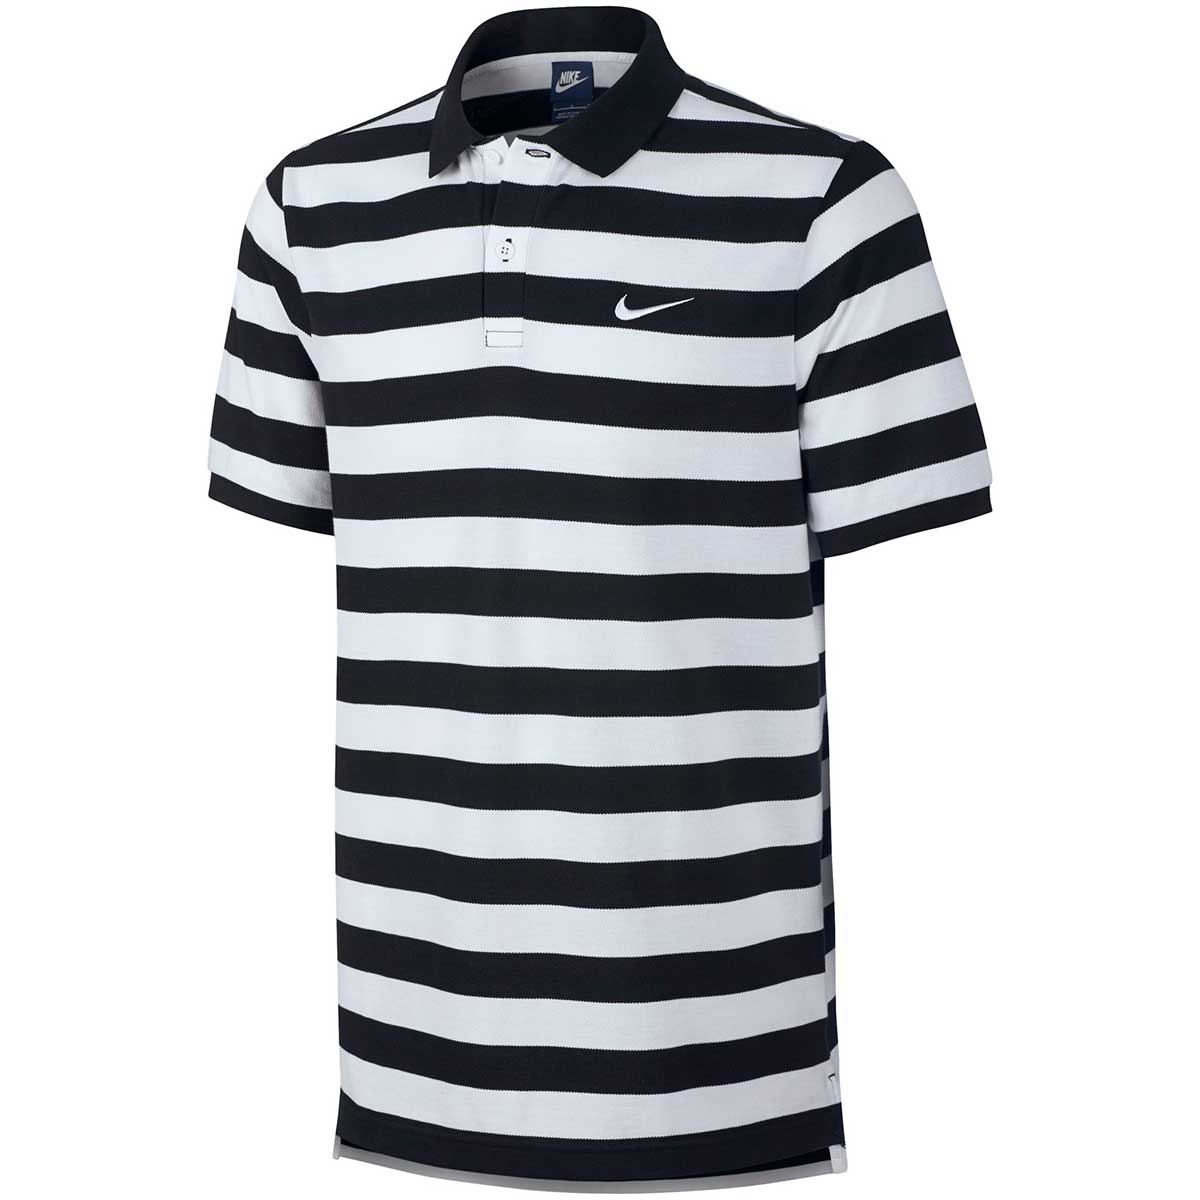 Buy Nike Men s Matchup Cotton Polo (Black White) Online India 223efaf32400